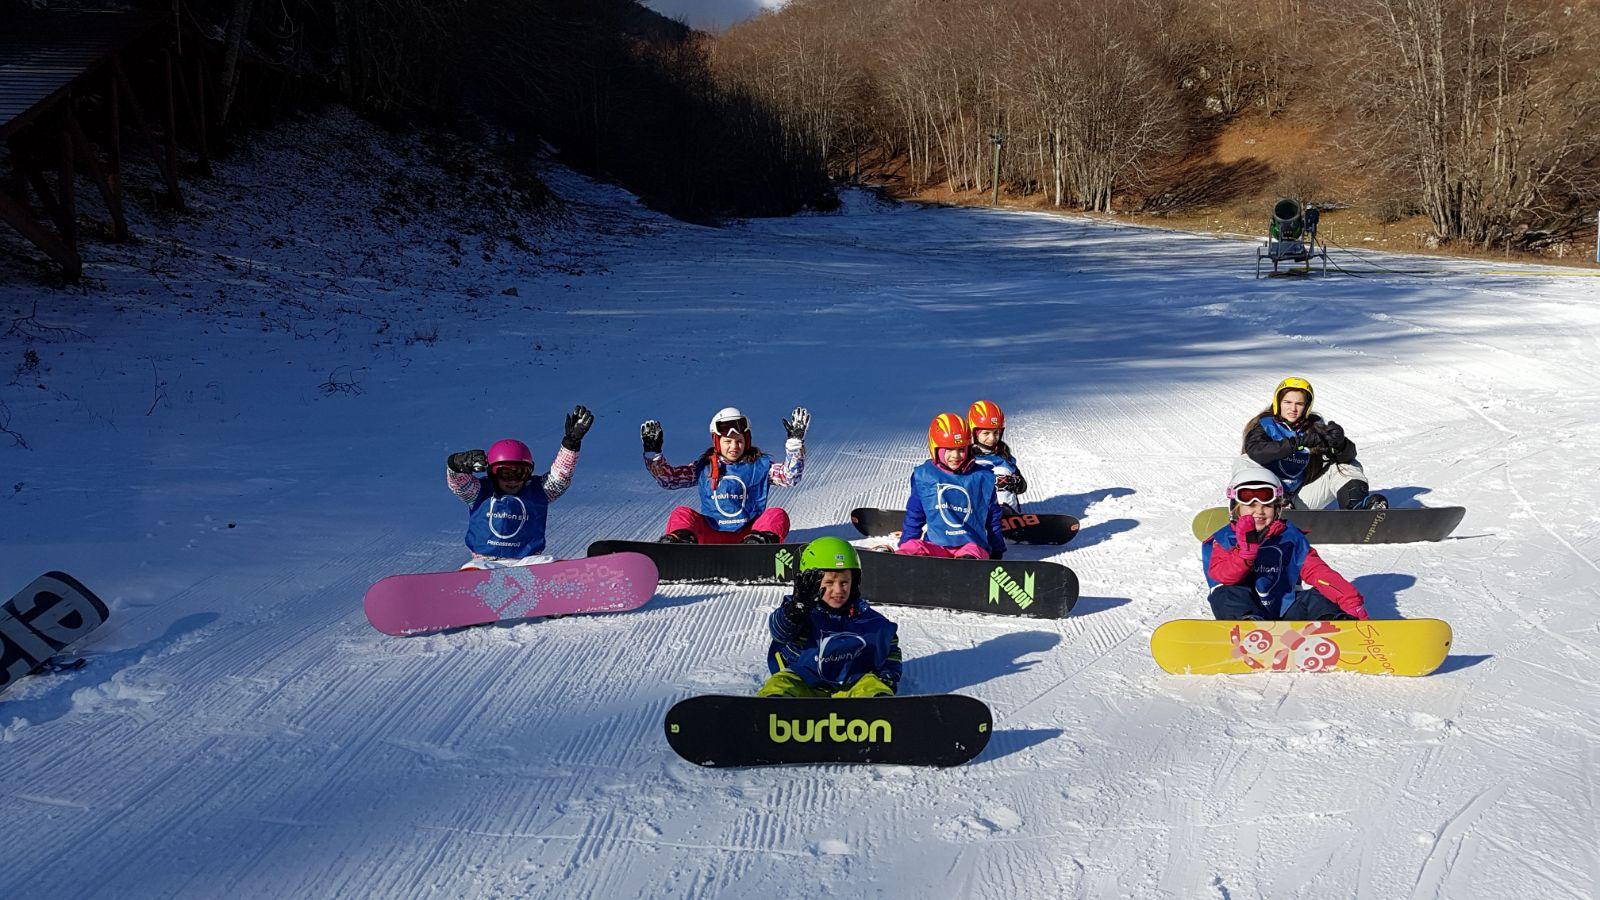 evolutionski-pescasseroli snowboard-abruzzo-4